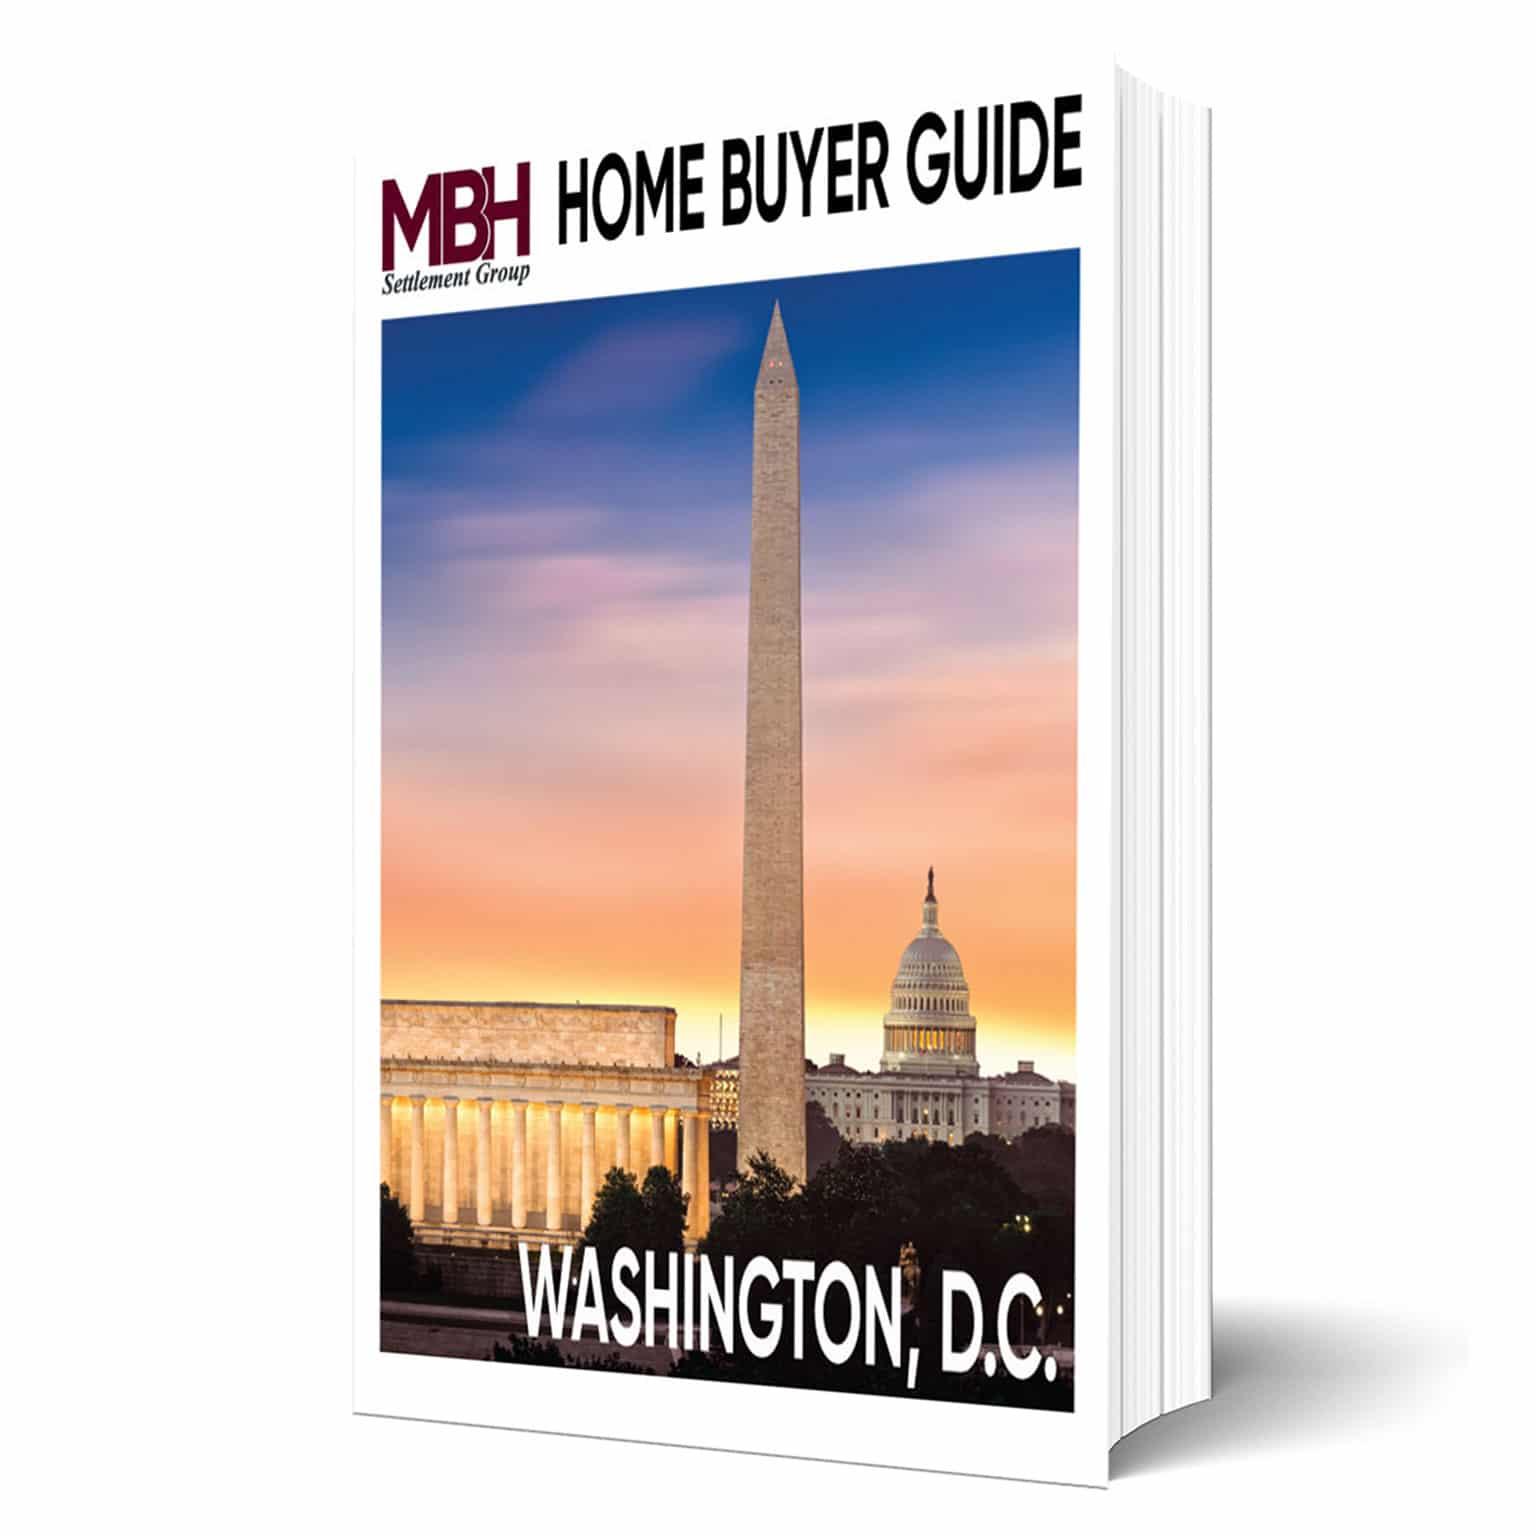 Virginia Home Buyer Guide